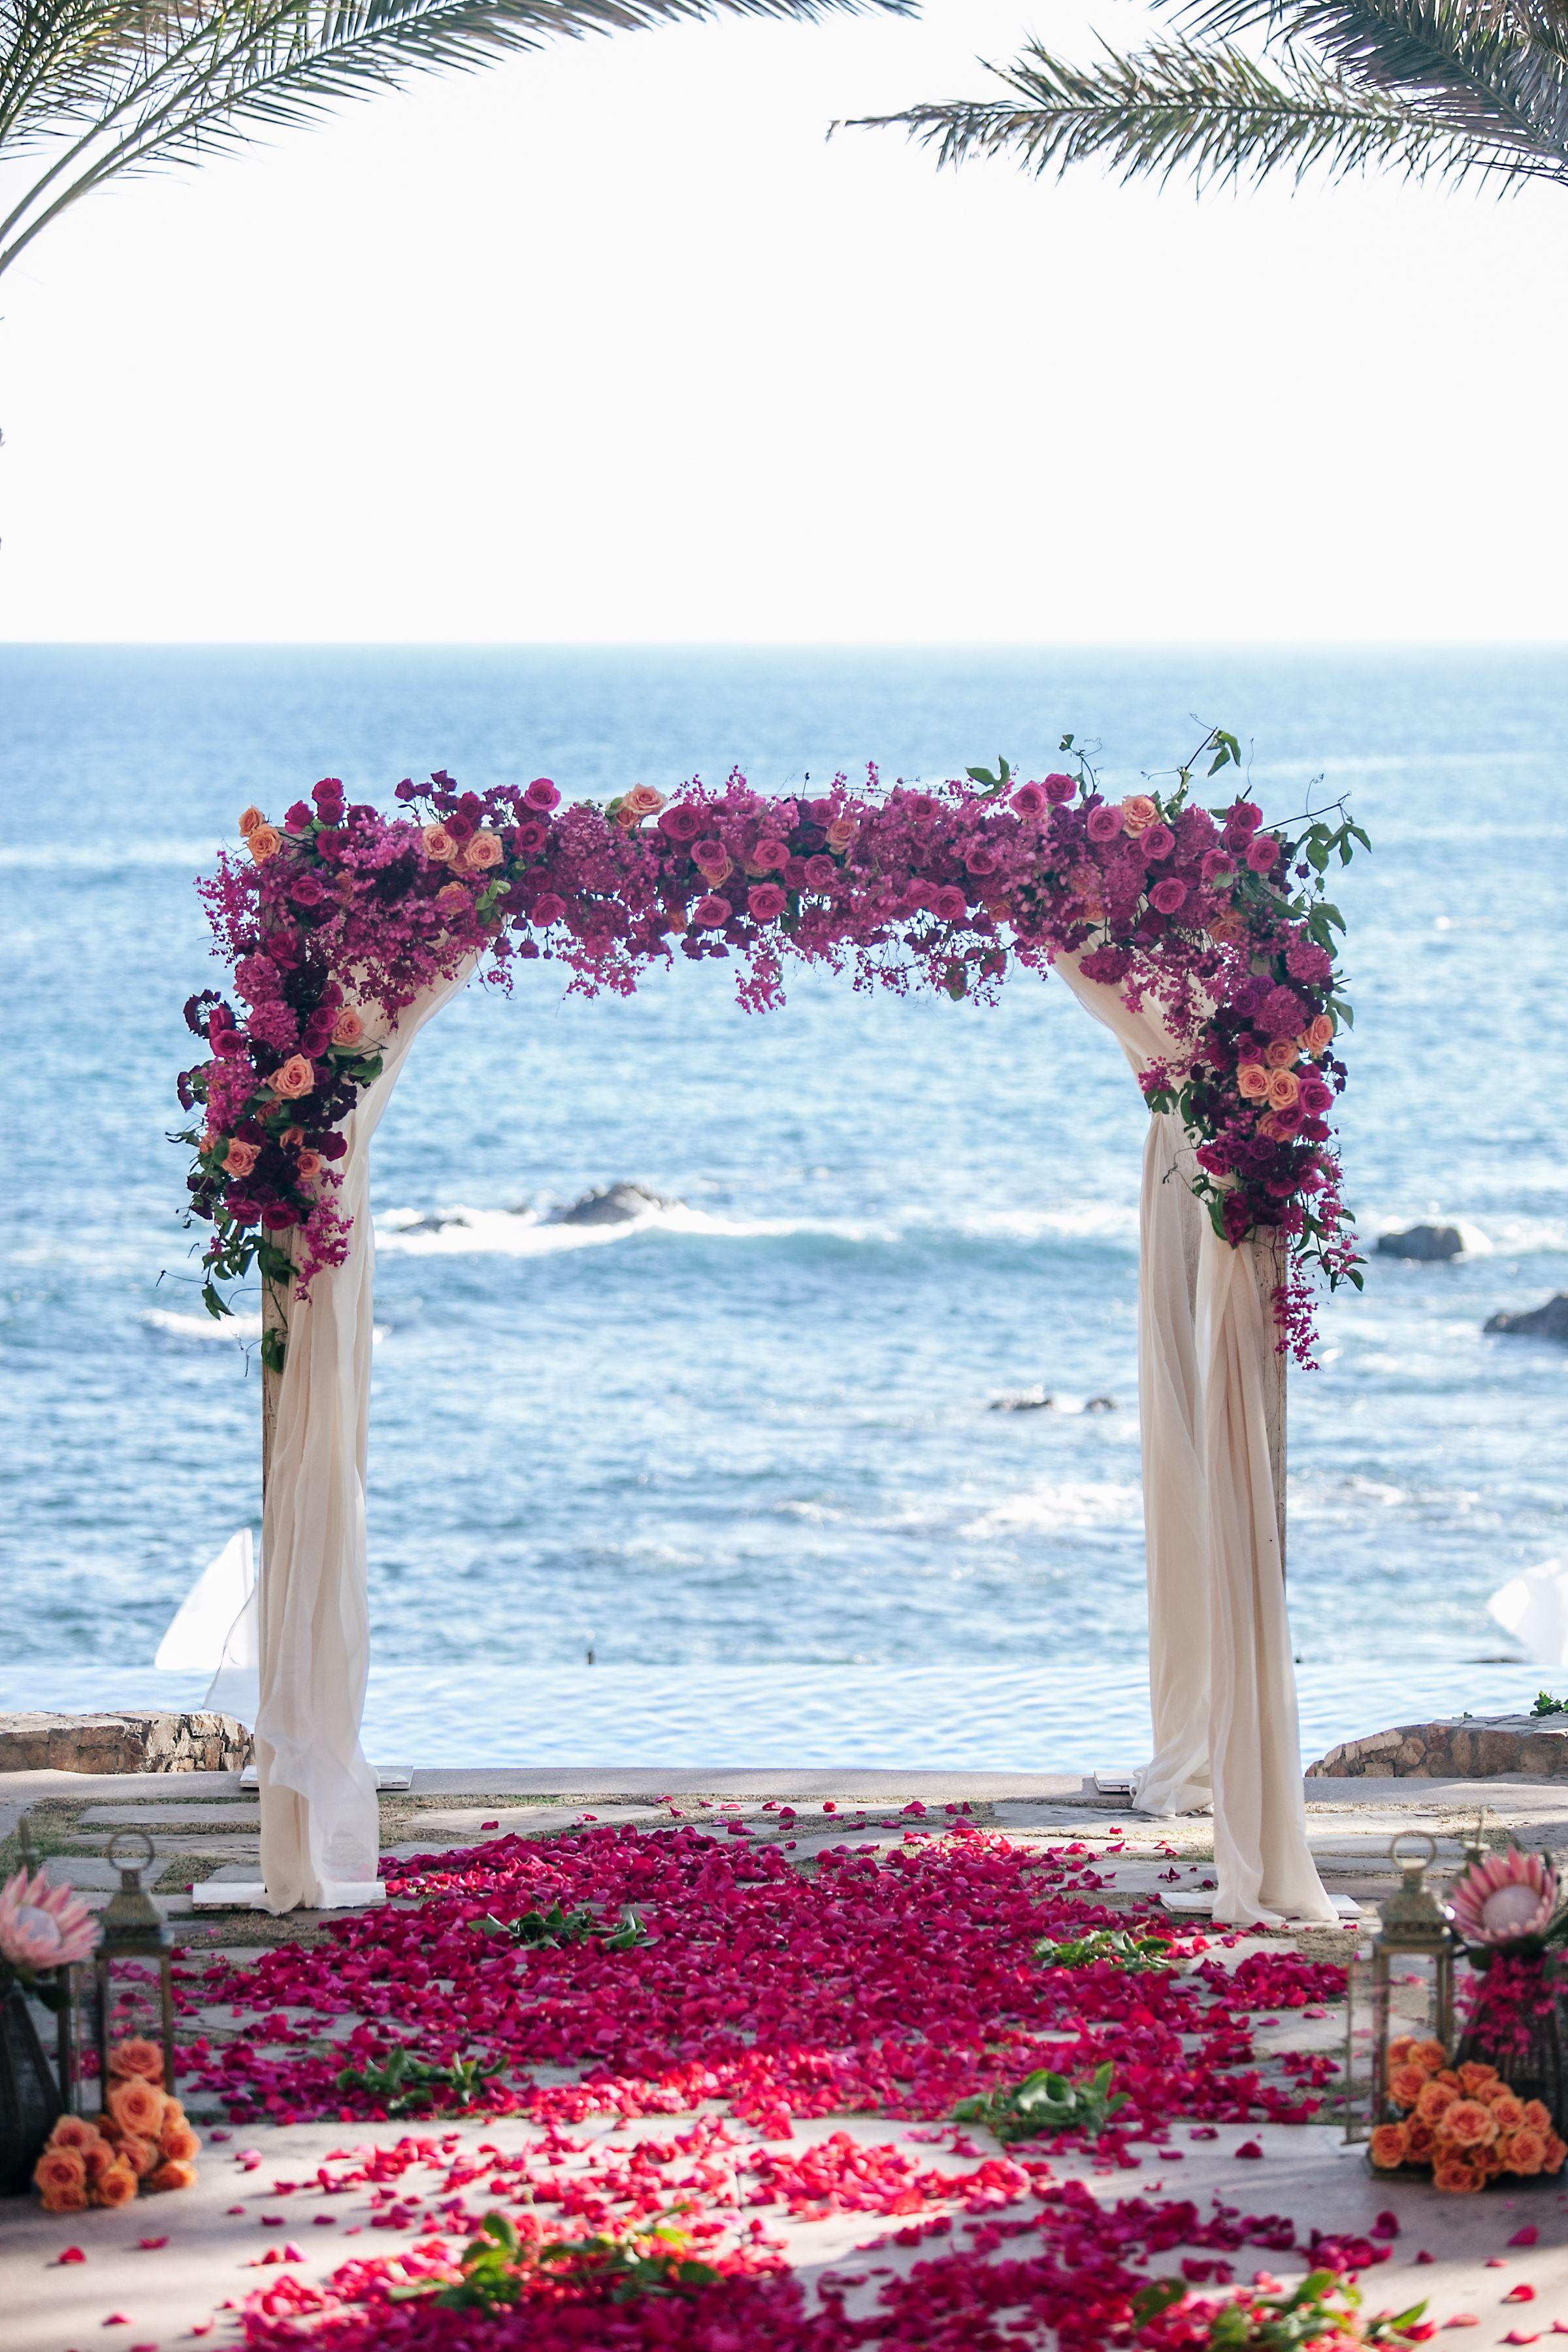 Wedding decoration ideas kerala  Colorful Cabo Wedding  Cabo Beach weddings and Vaulting